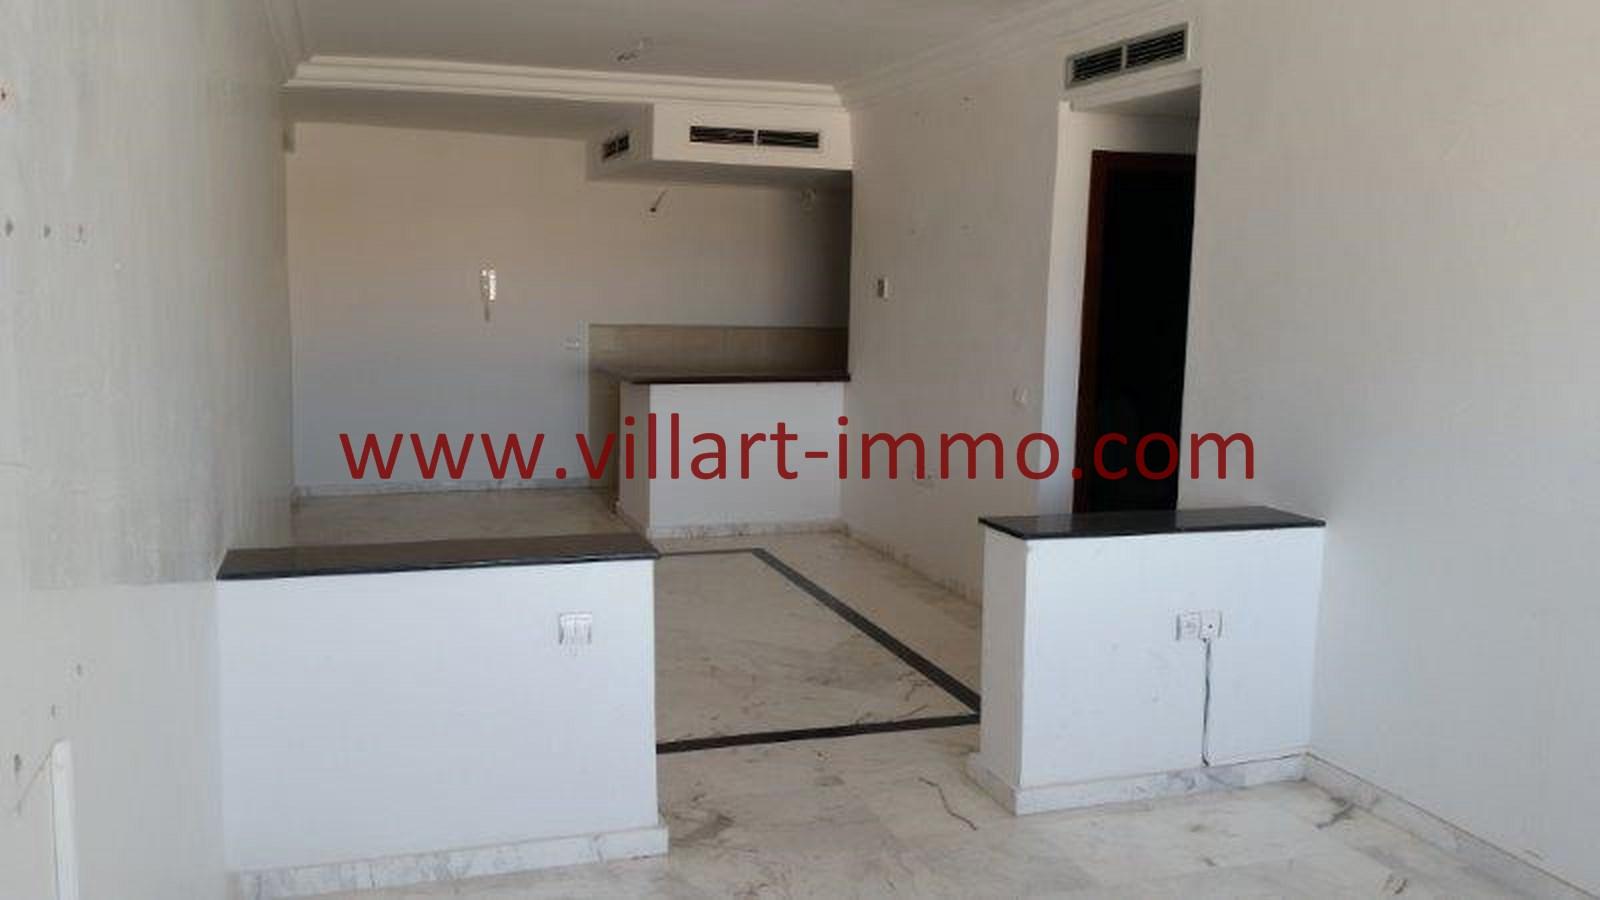 4-location-appartement-non-meuble-centre-ville-tanger-salon-l803-villart-immo